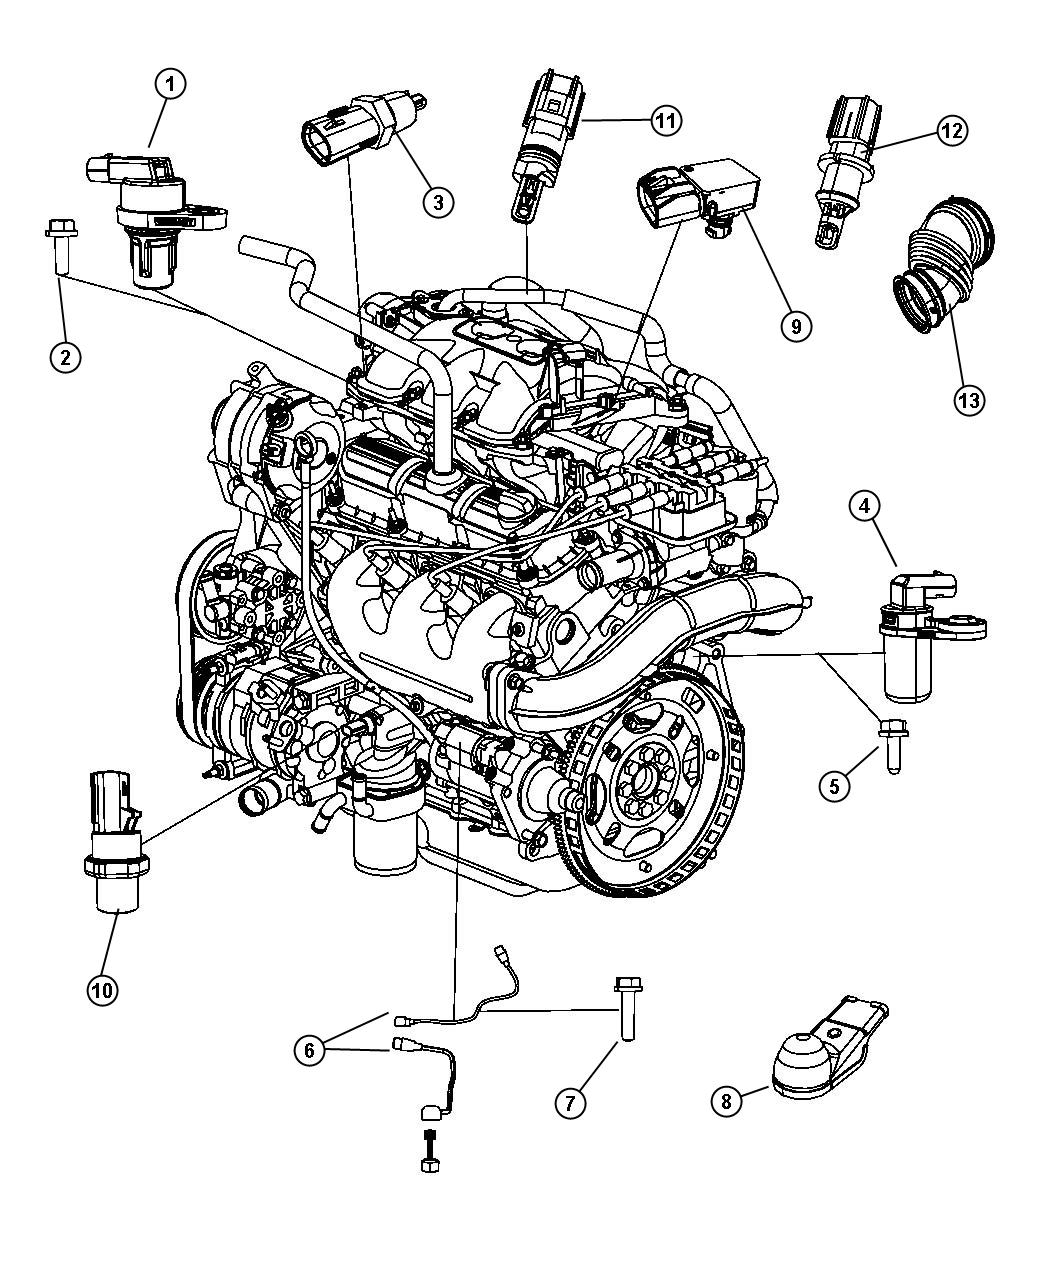 chrysler pacifica 4 0 engine diagram